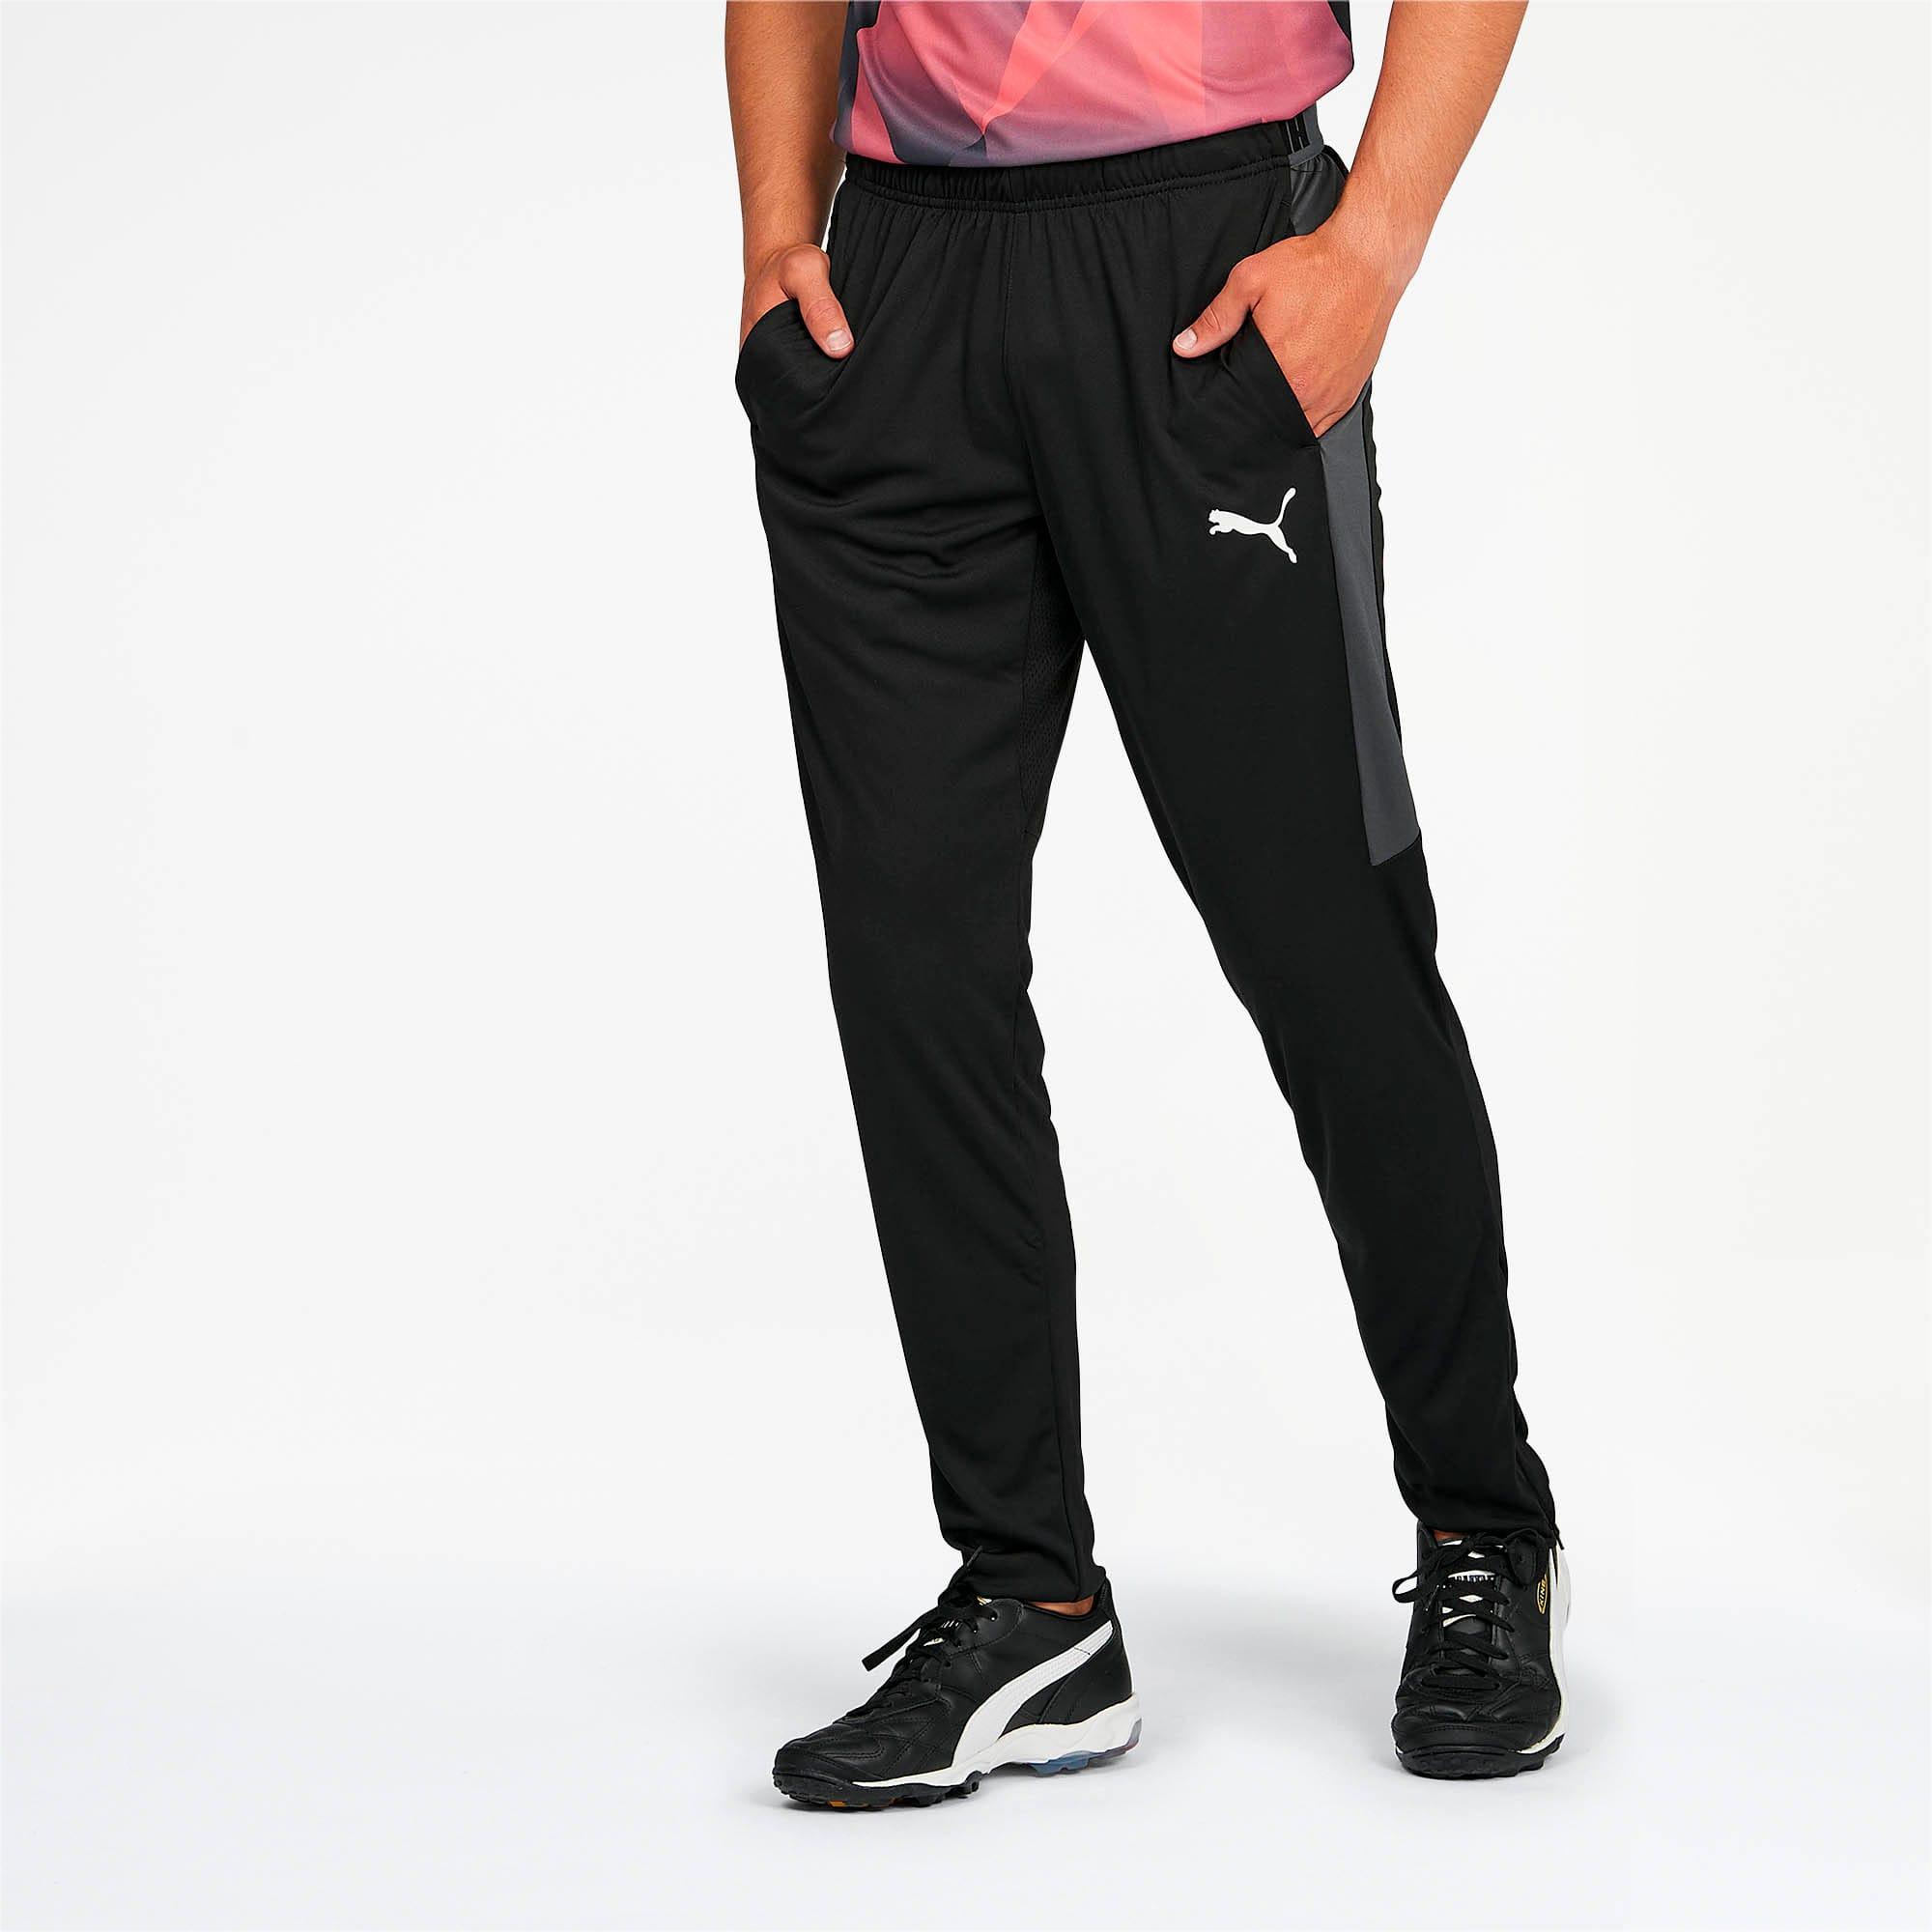 Thumbnail 1 of Men's Speed Pants, Puma Black-Asphalt, medium